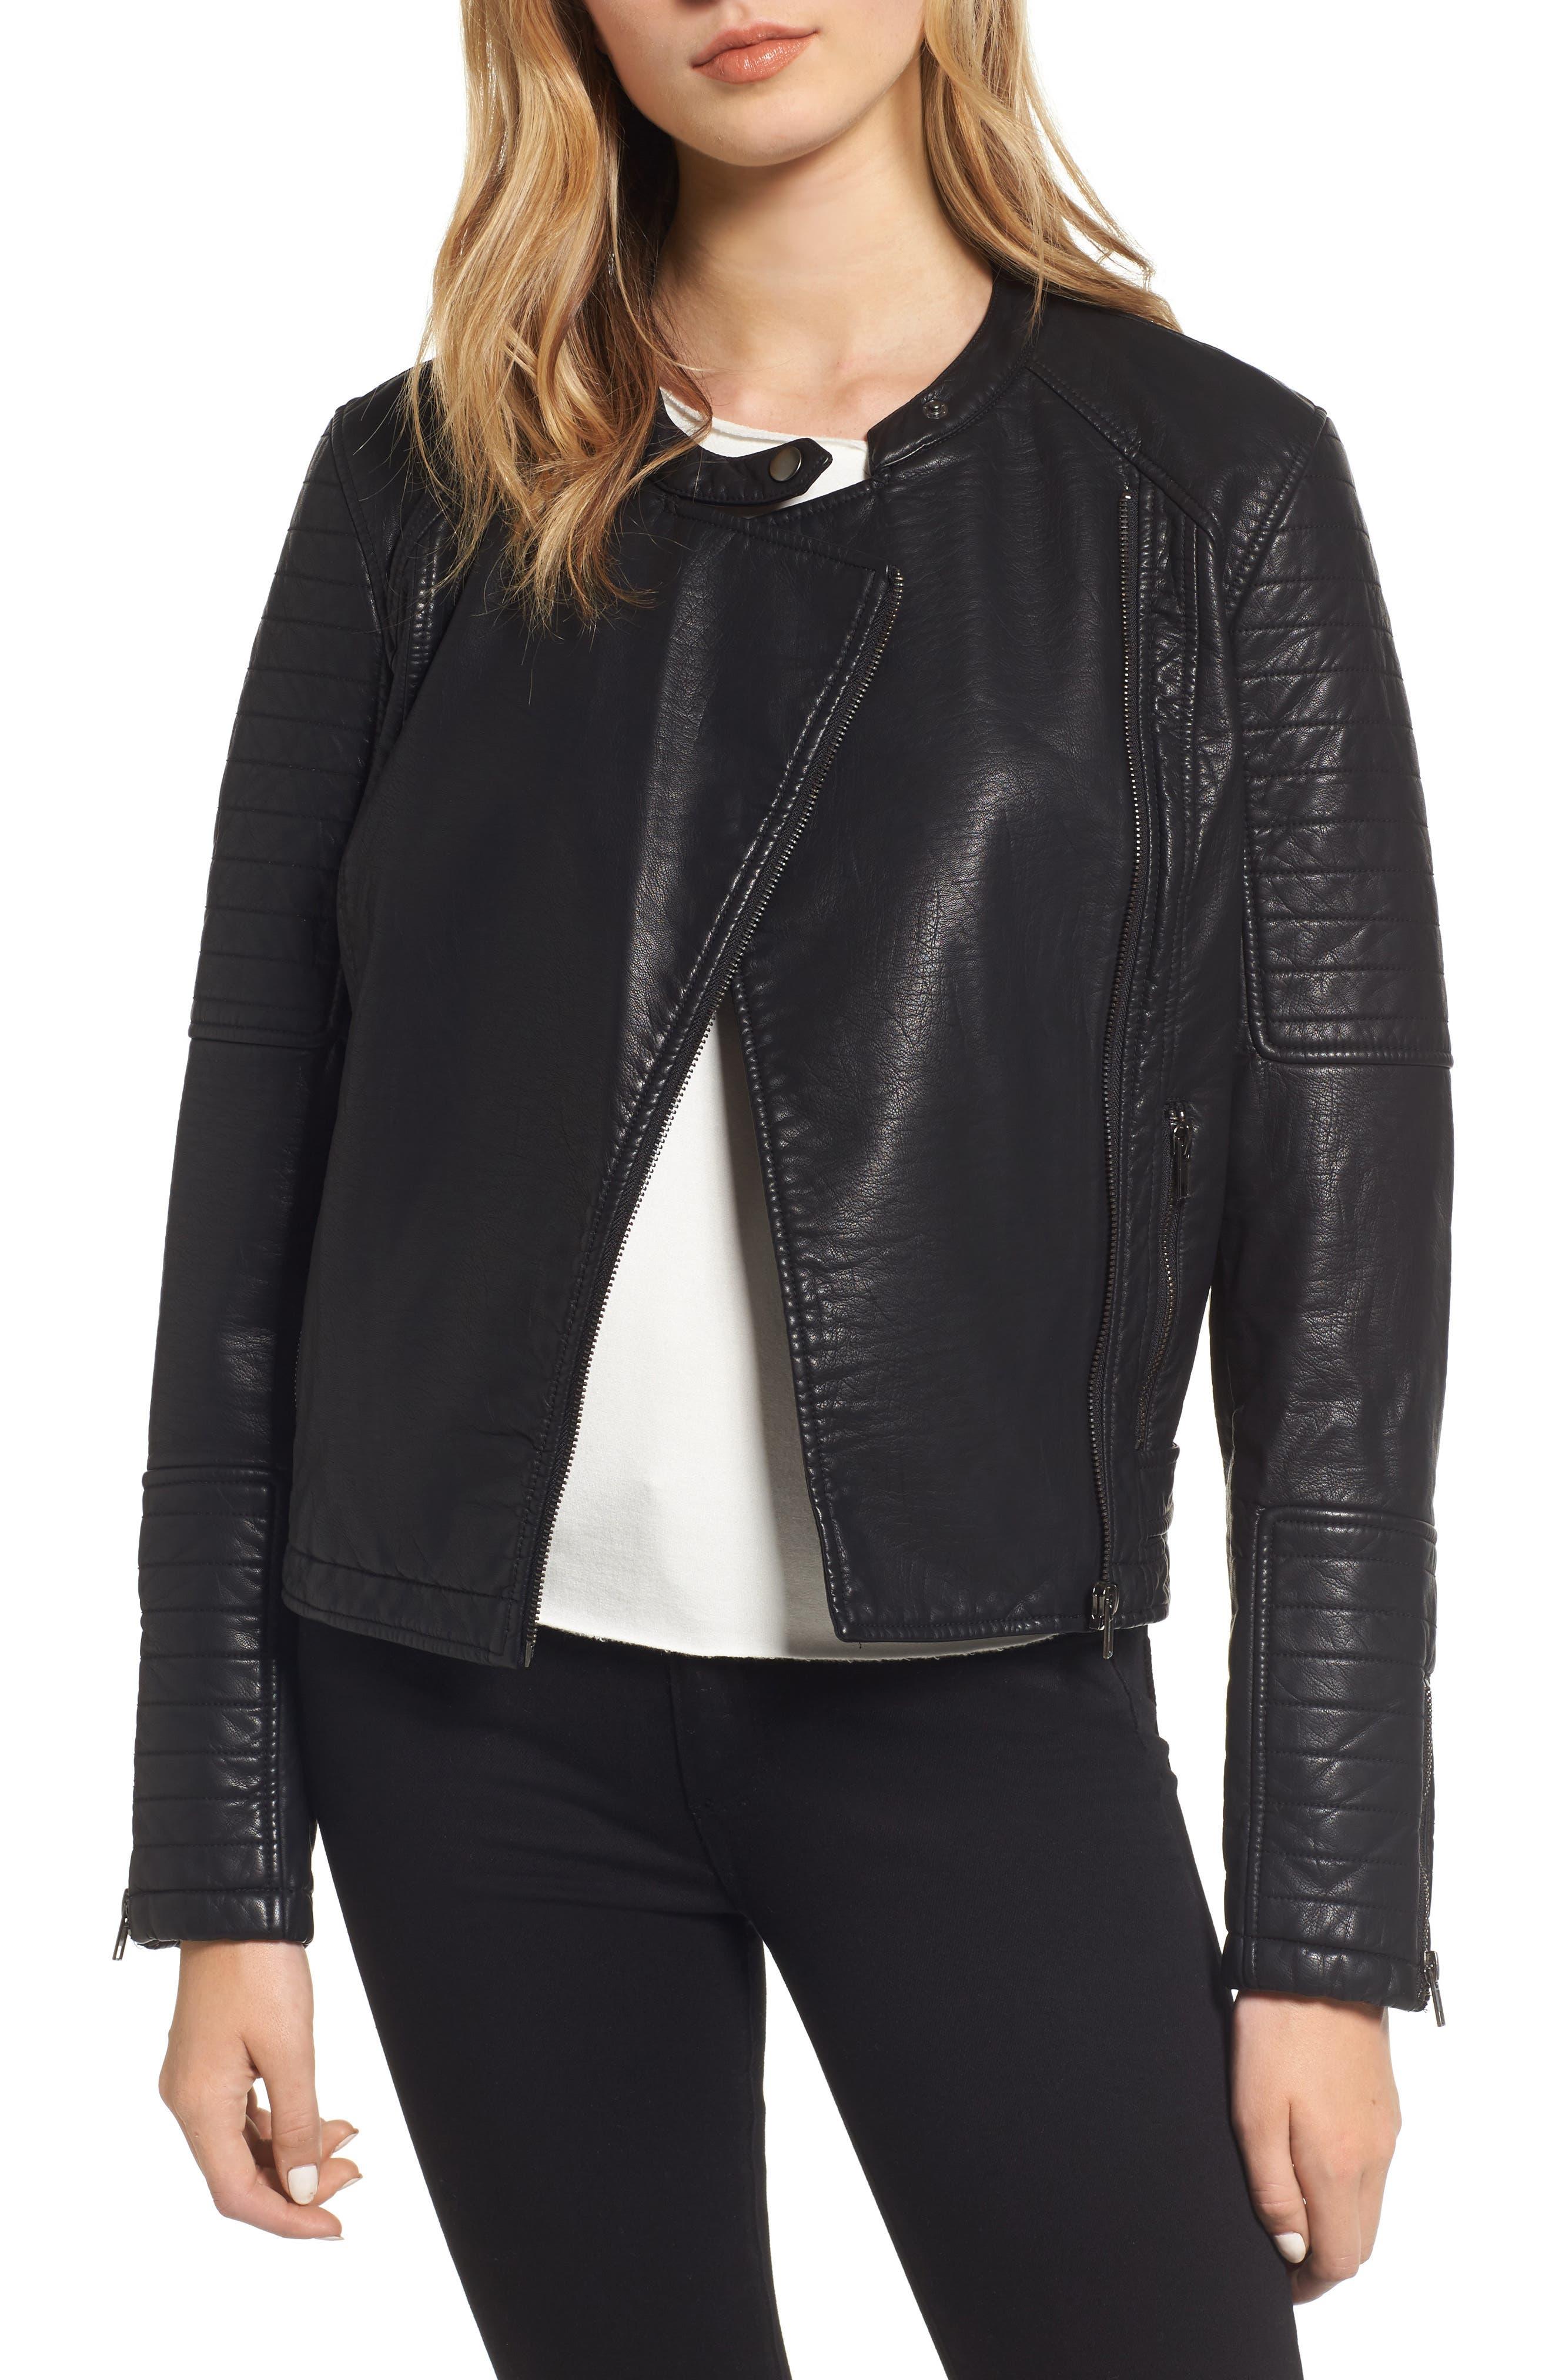 Ezmerelda Faux Leather Moto Jacket,                             Main thumbnail 1, color,                             Black